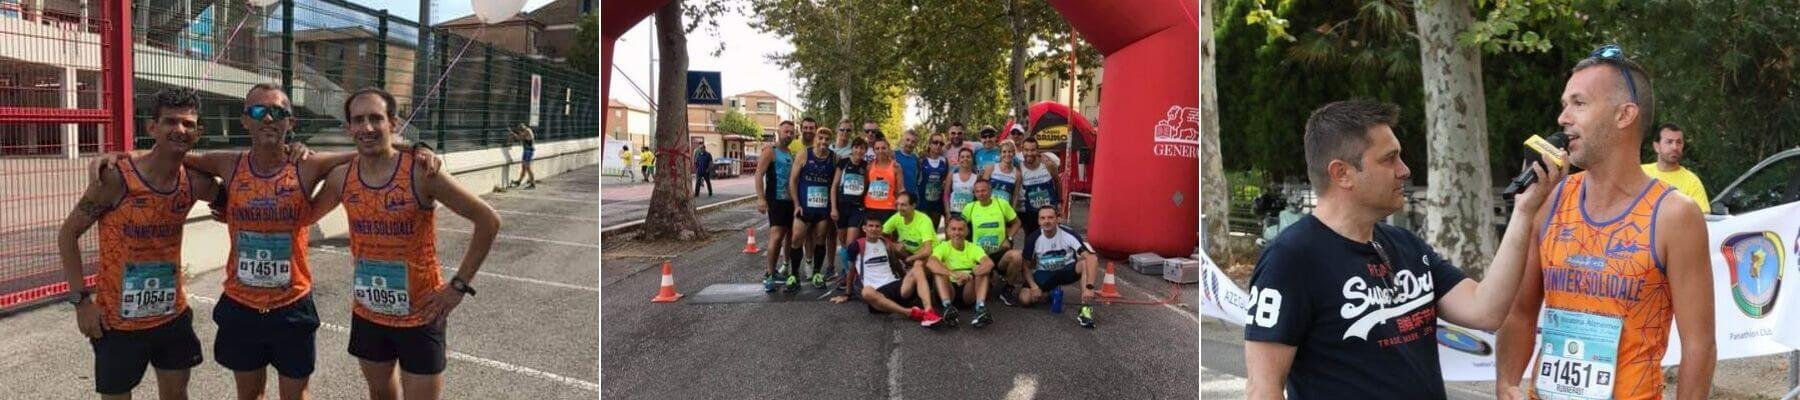 mezza maratona alzheimer partenza